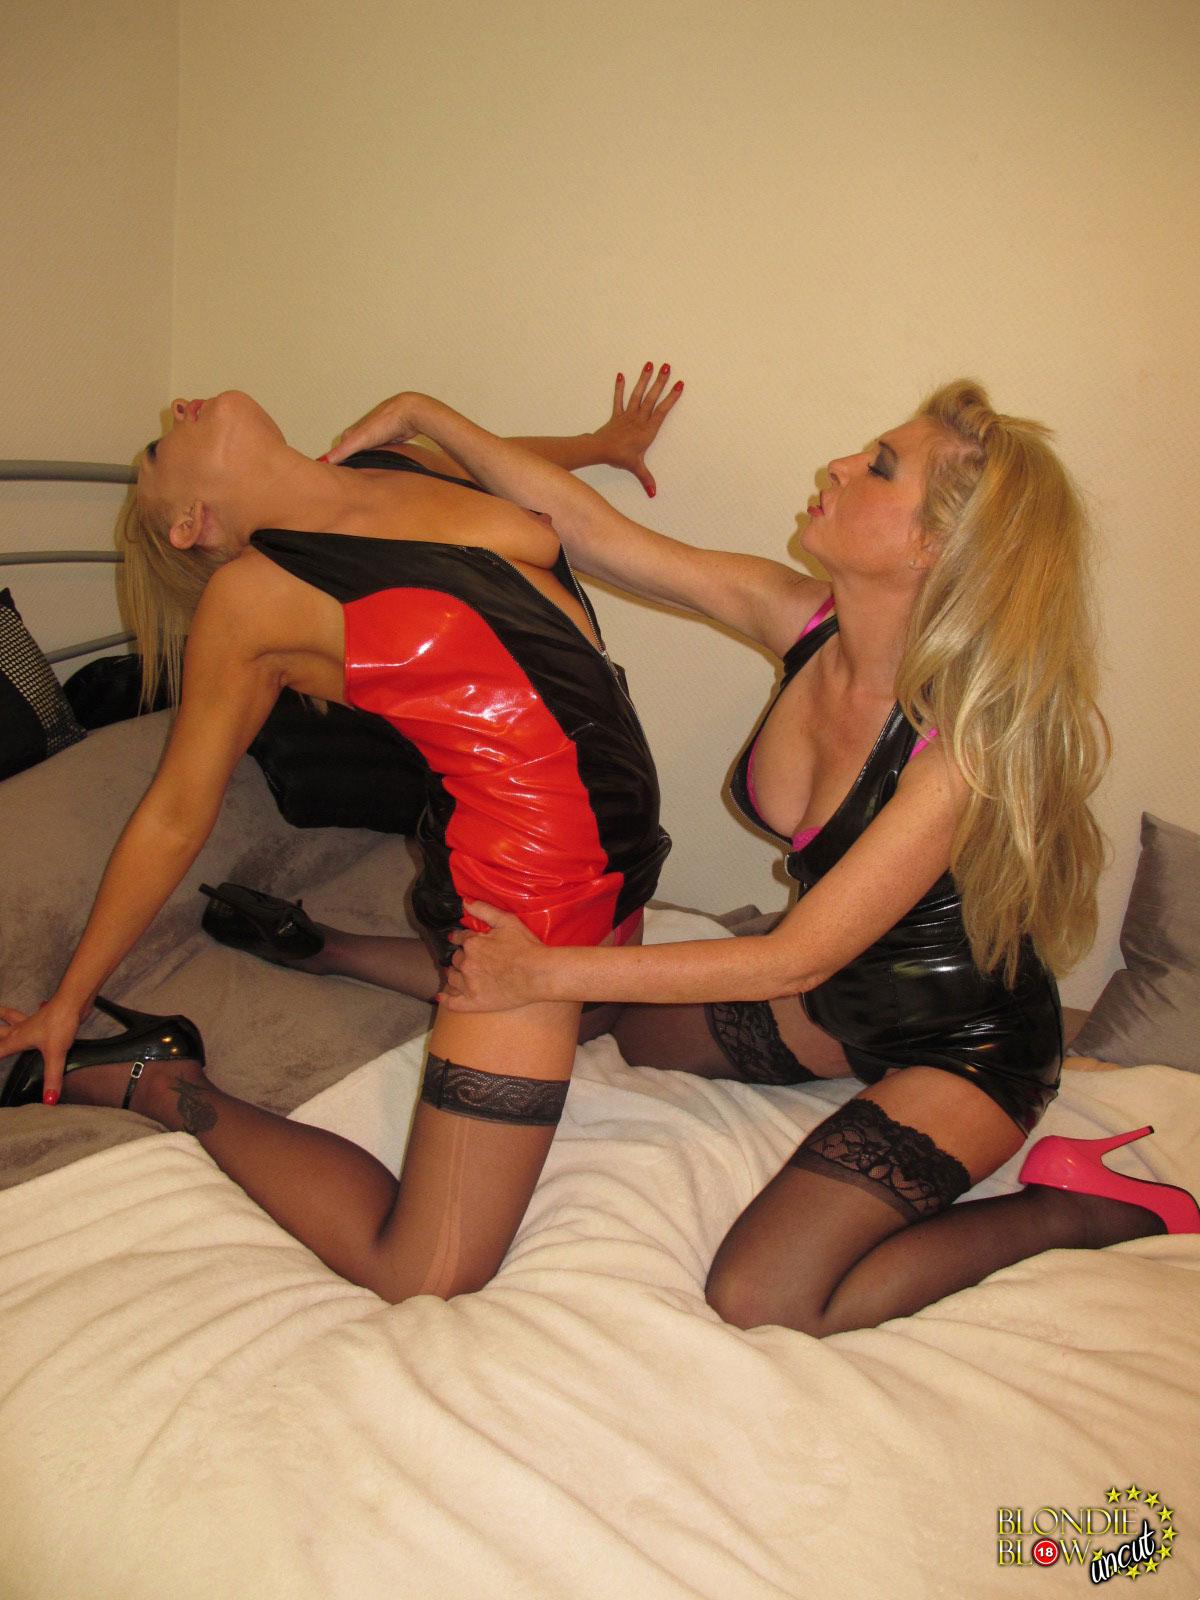 Blondie girlfriend having fun with her bbc comp 8